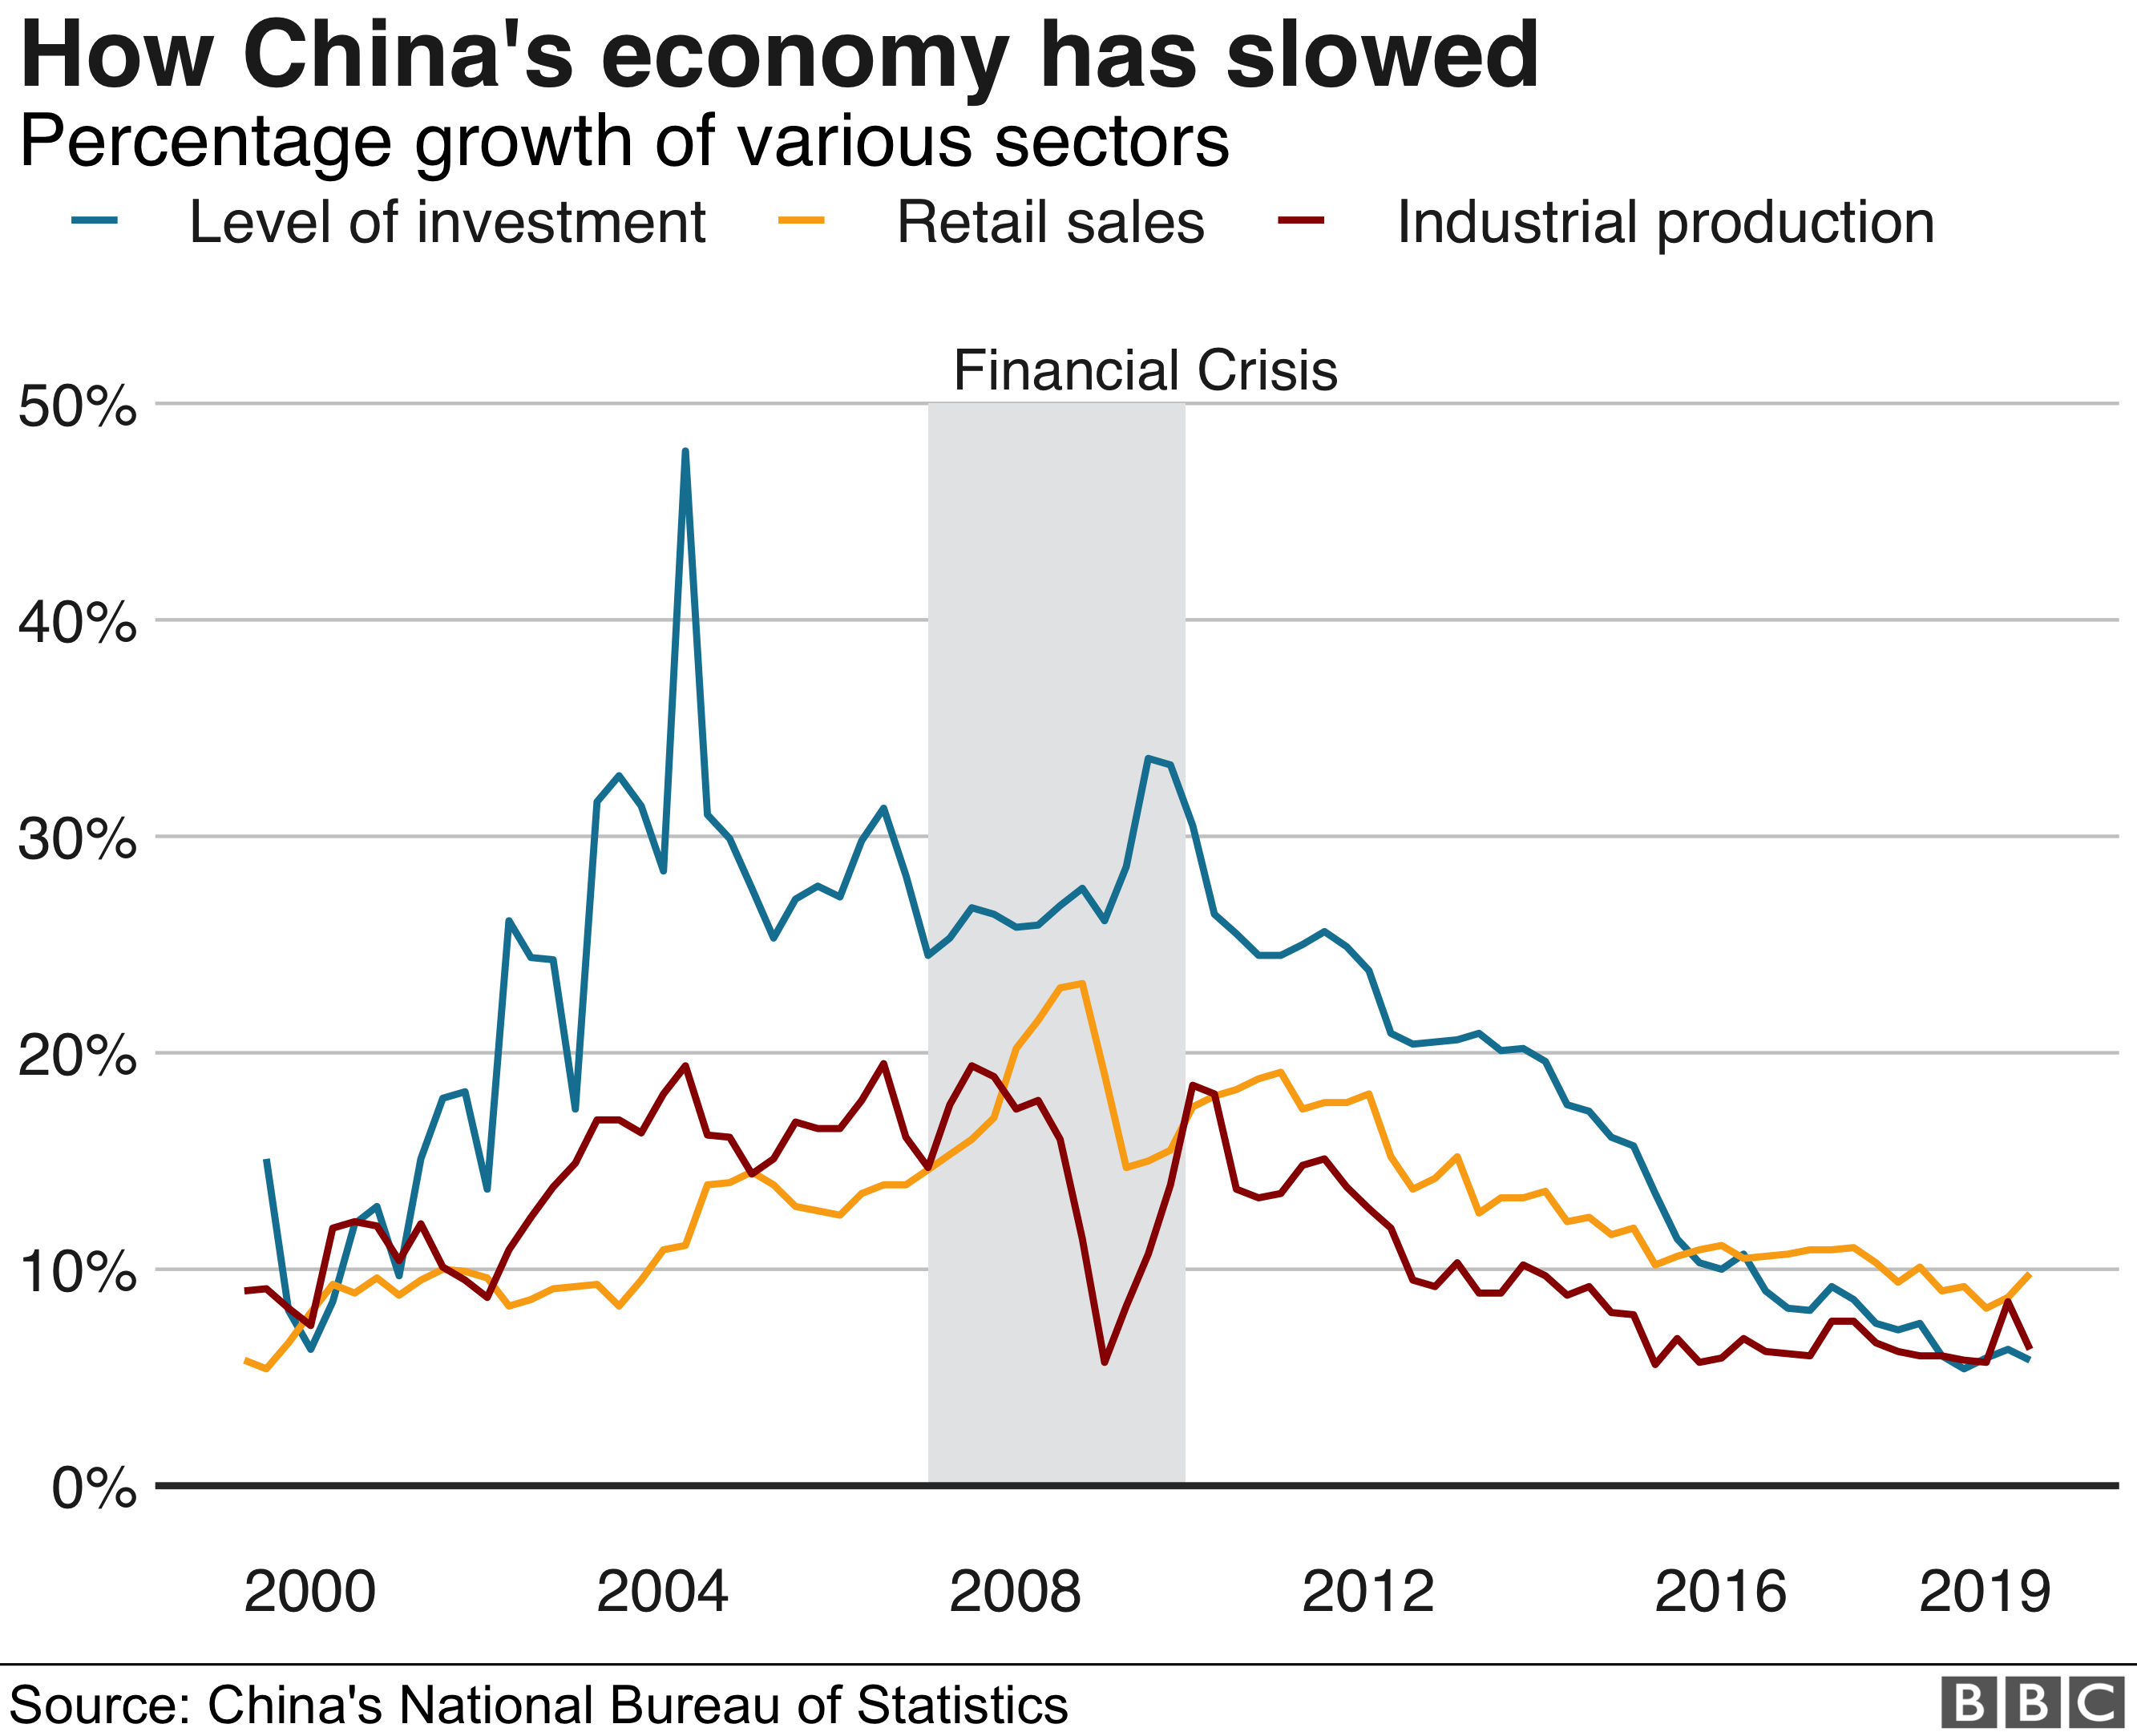 China's economic performance